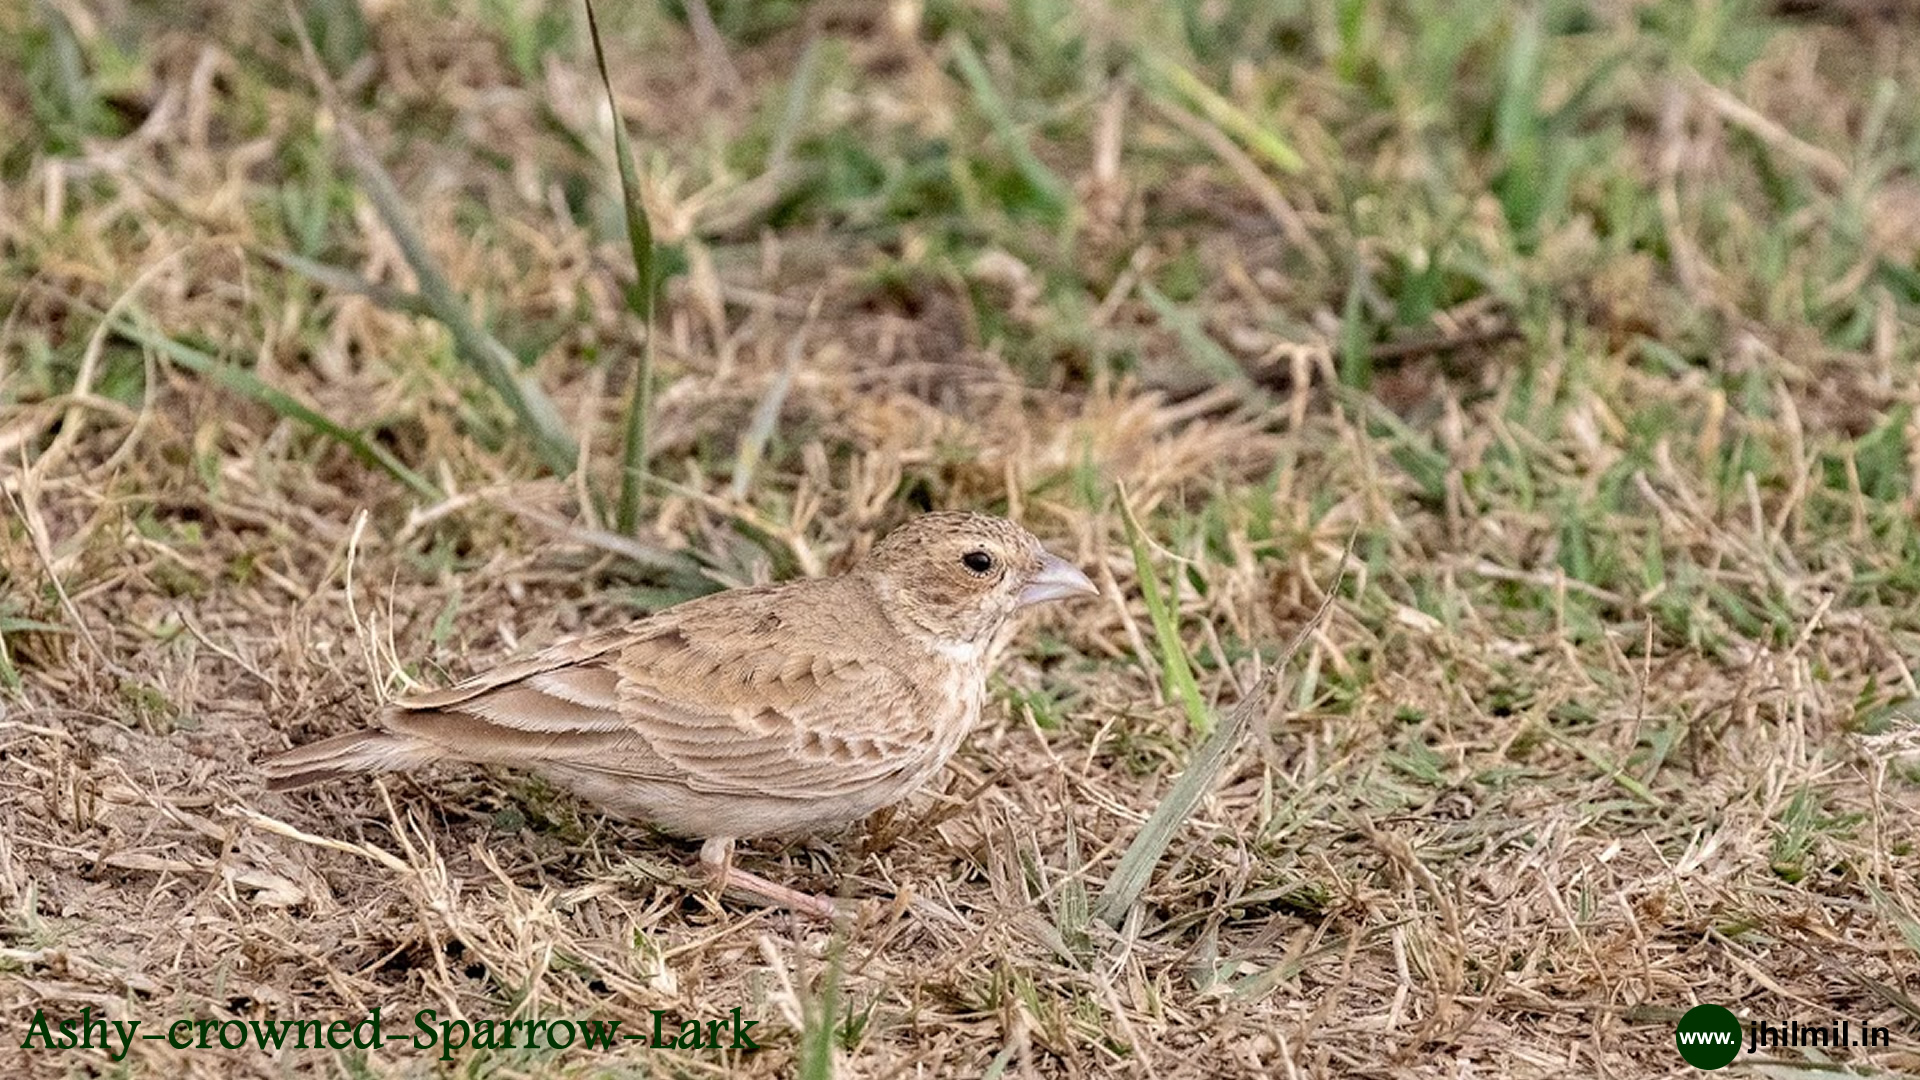 Ashy Crowned Sparrow Lark